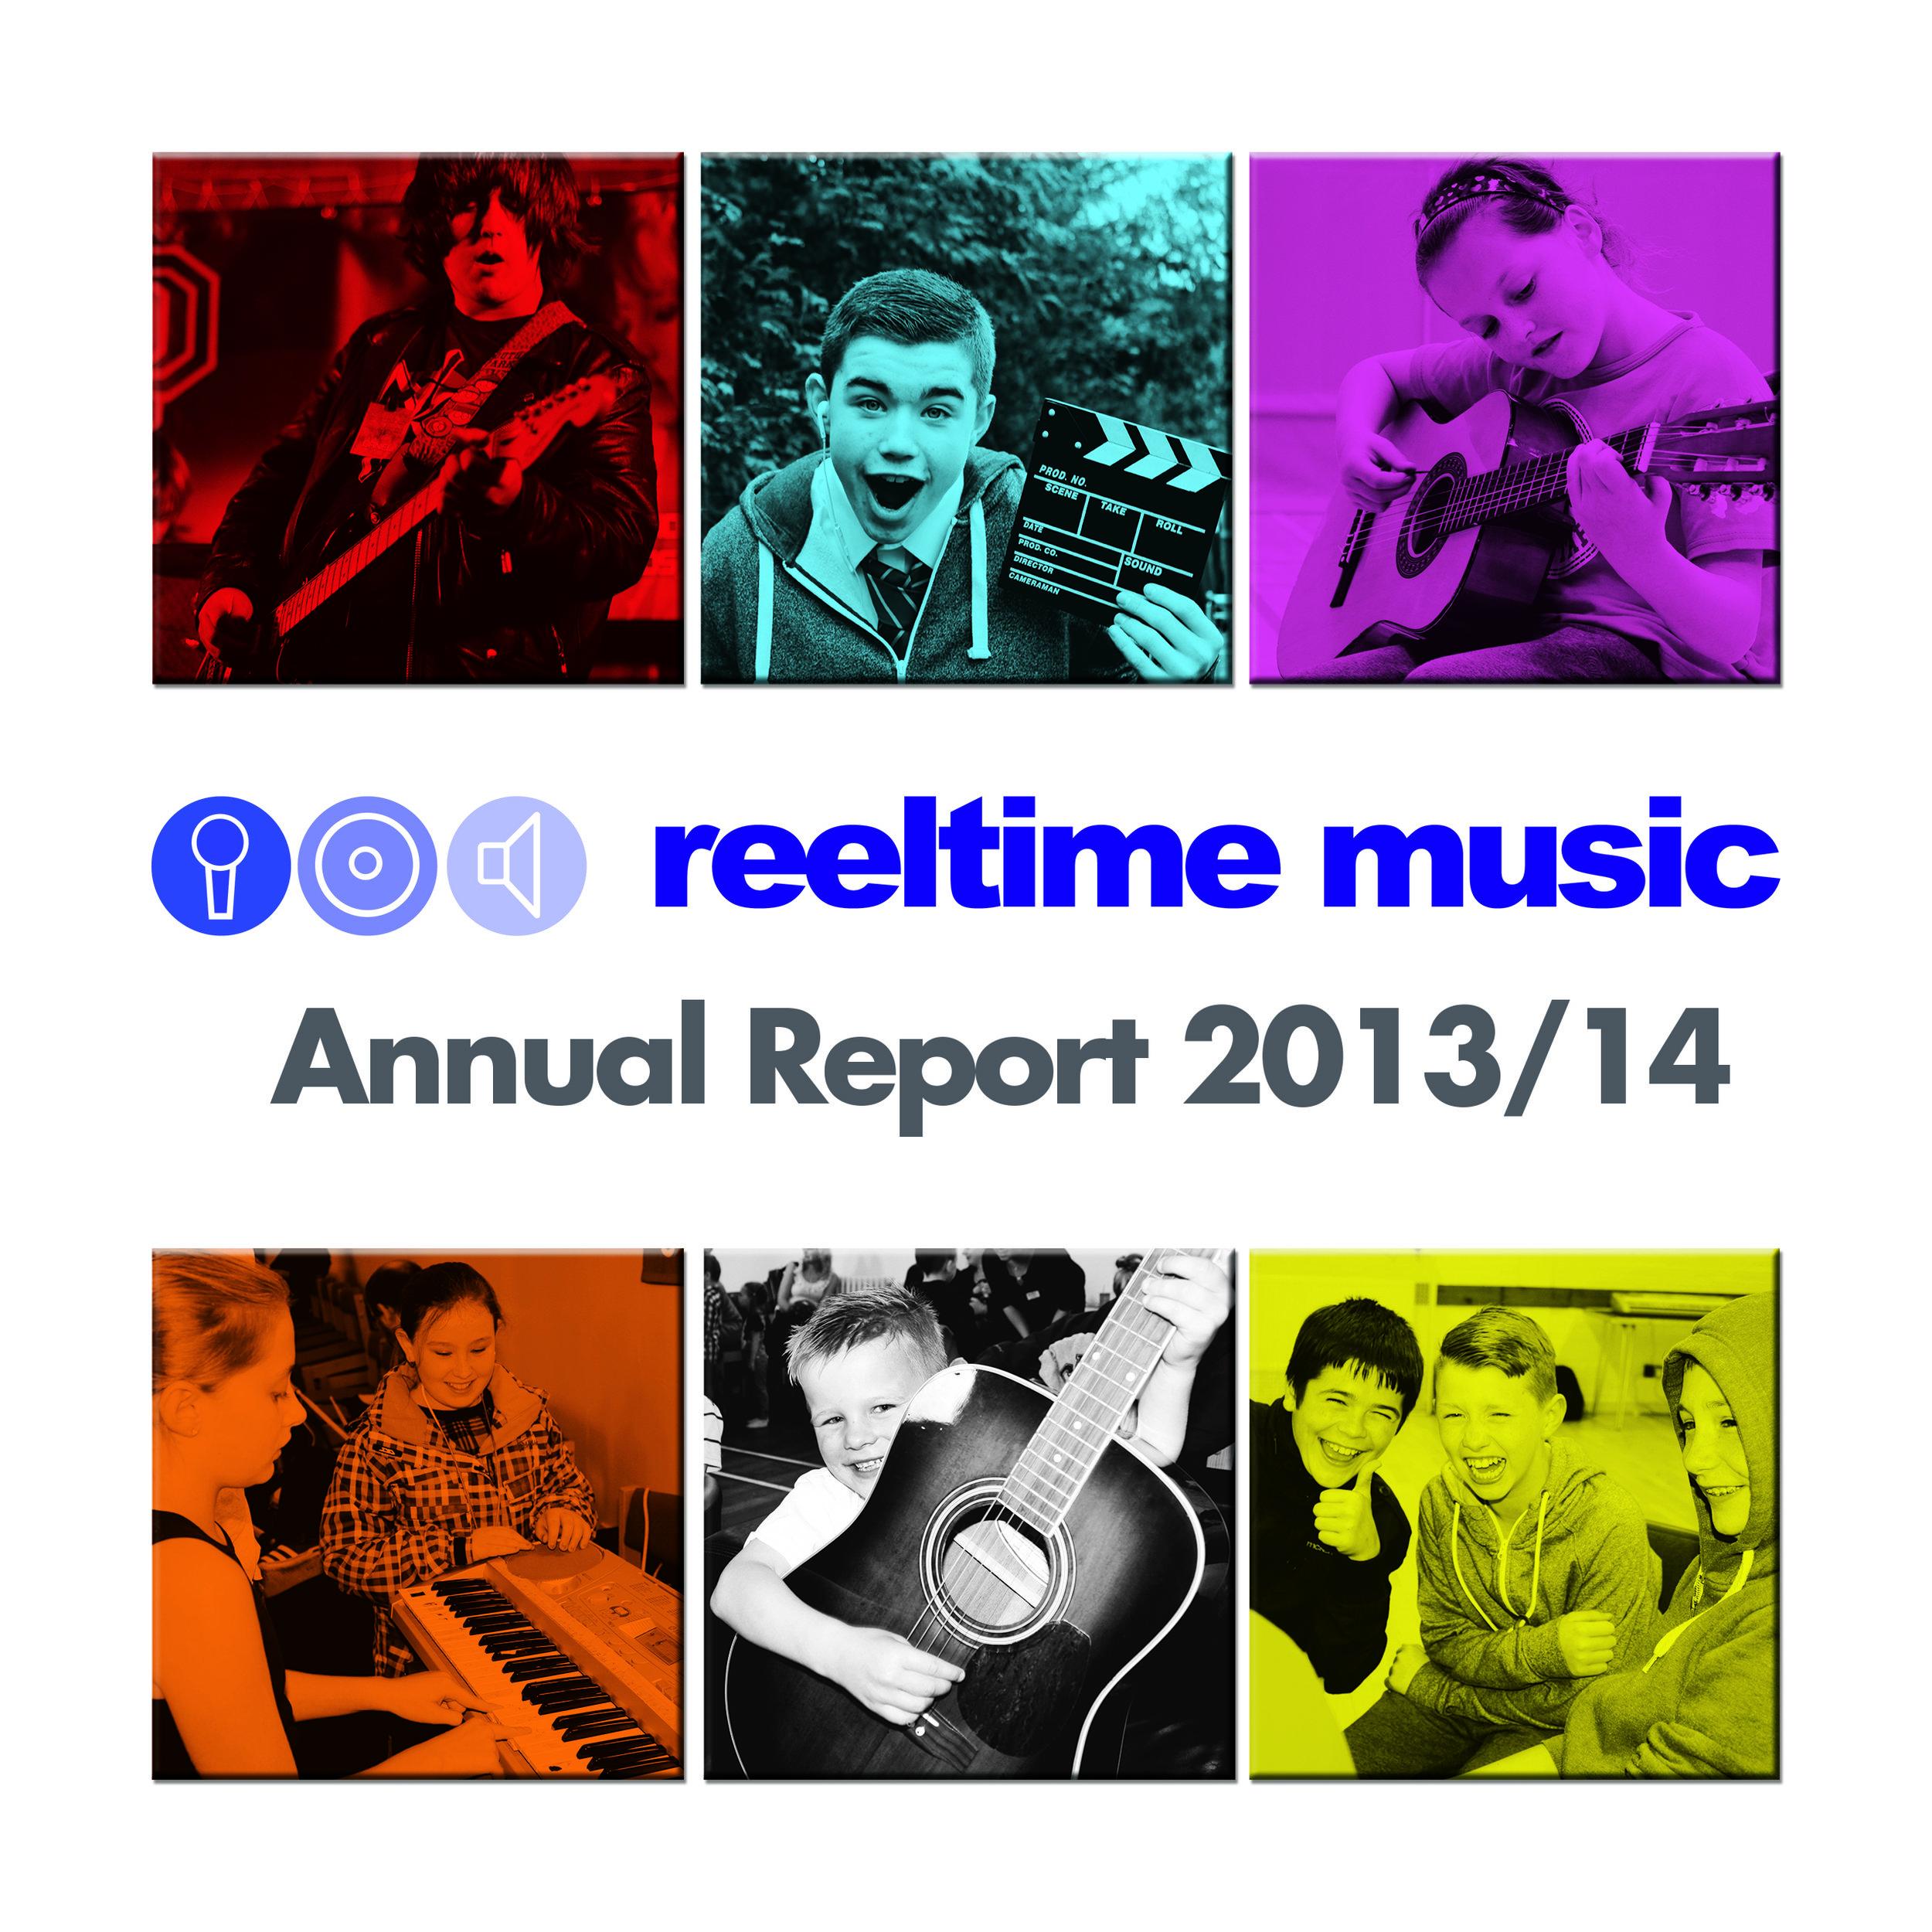 Annual Report 2013/14 -